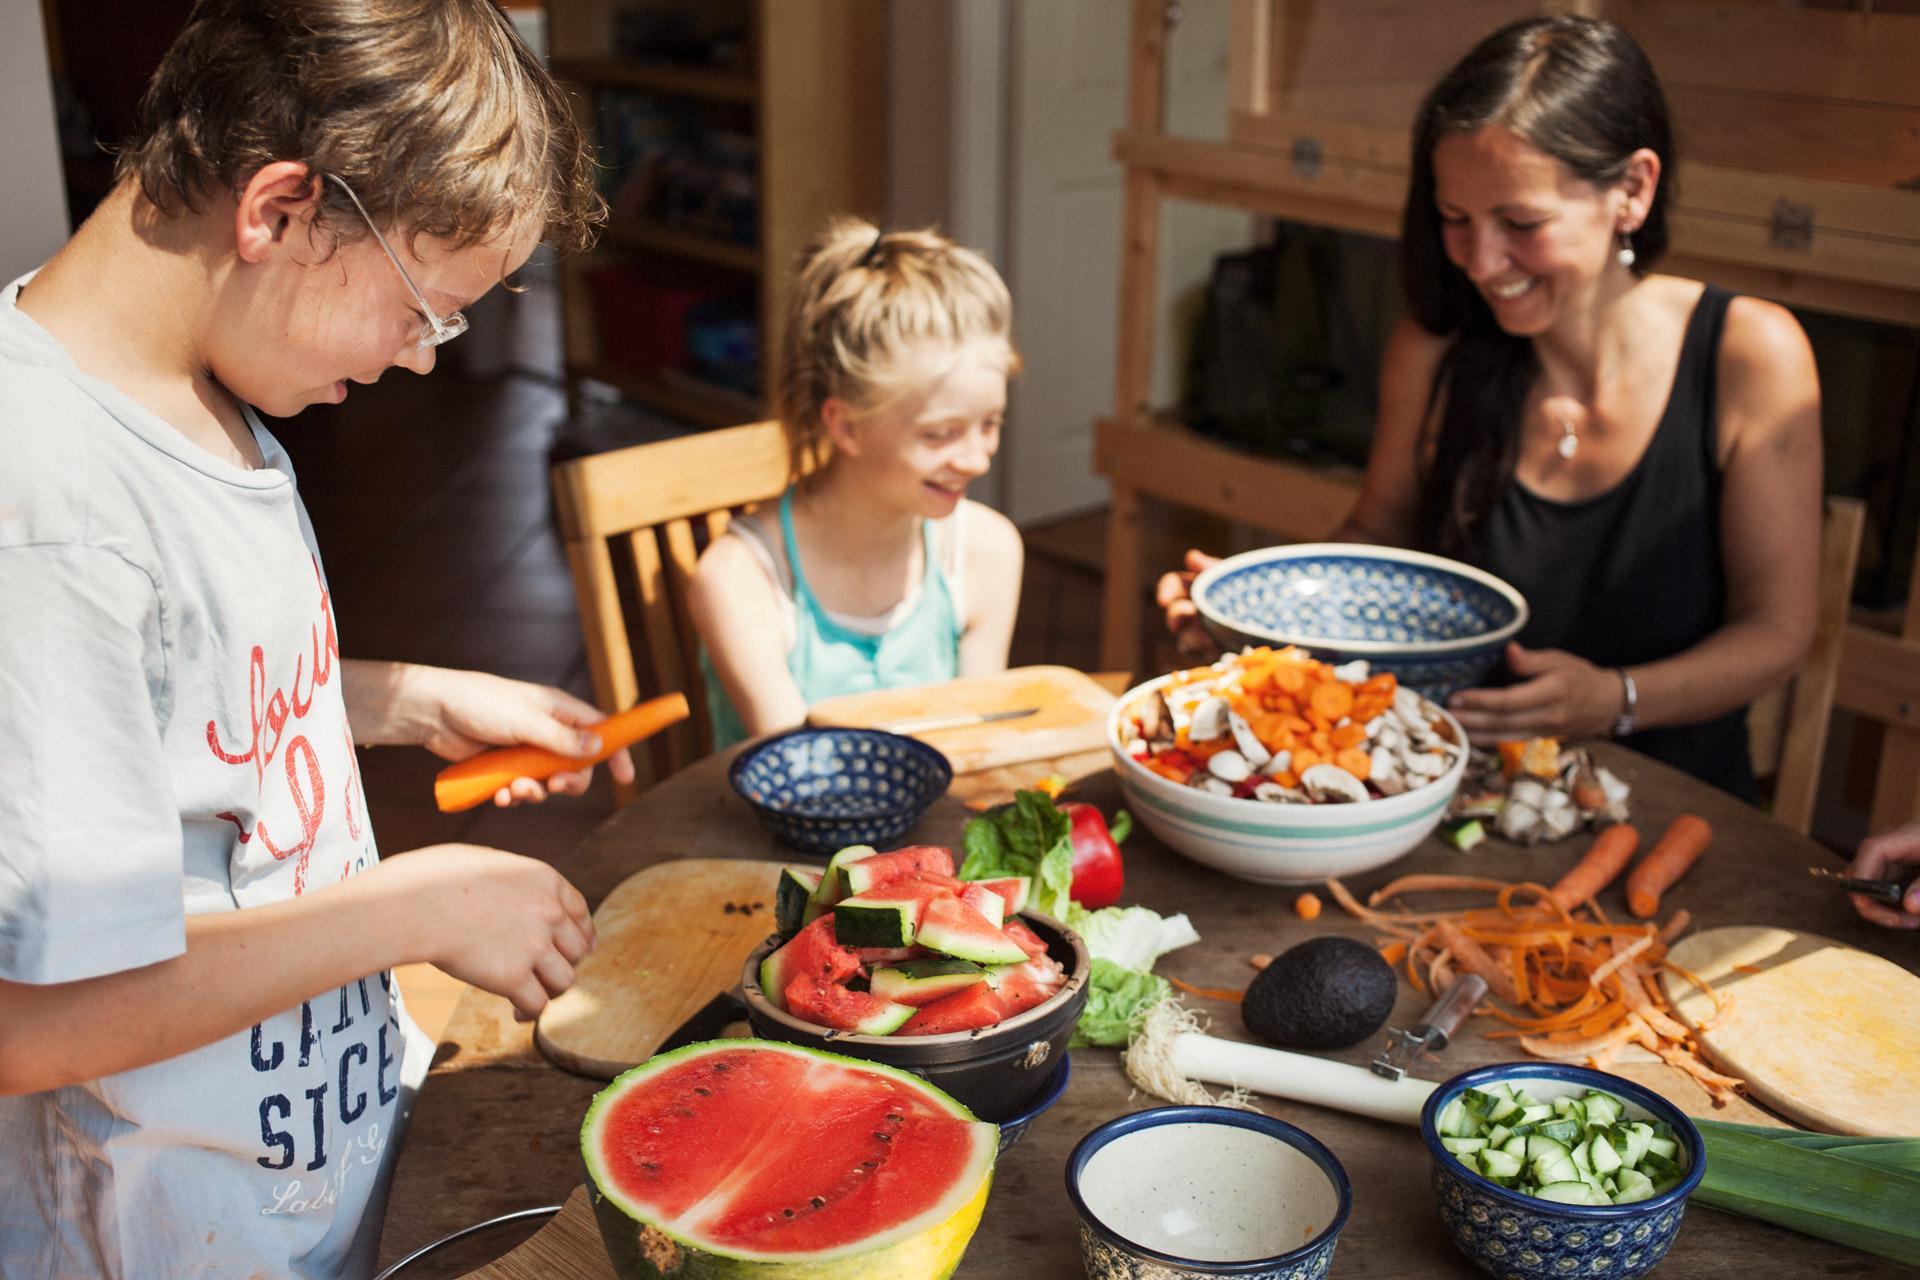 timo-stammberger-photography-fotografie-kinder-kochen-gesundes-essen-healthy-happy-food-plant-based-vegan-cooking